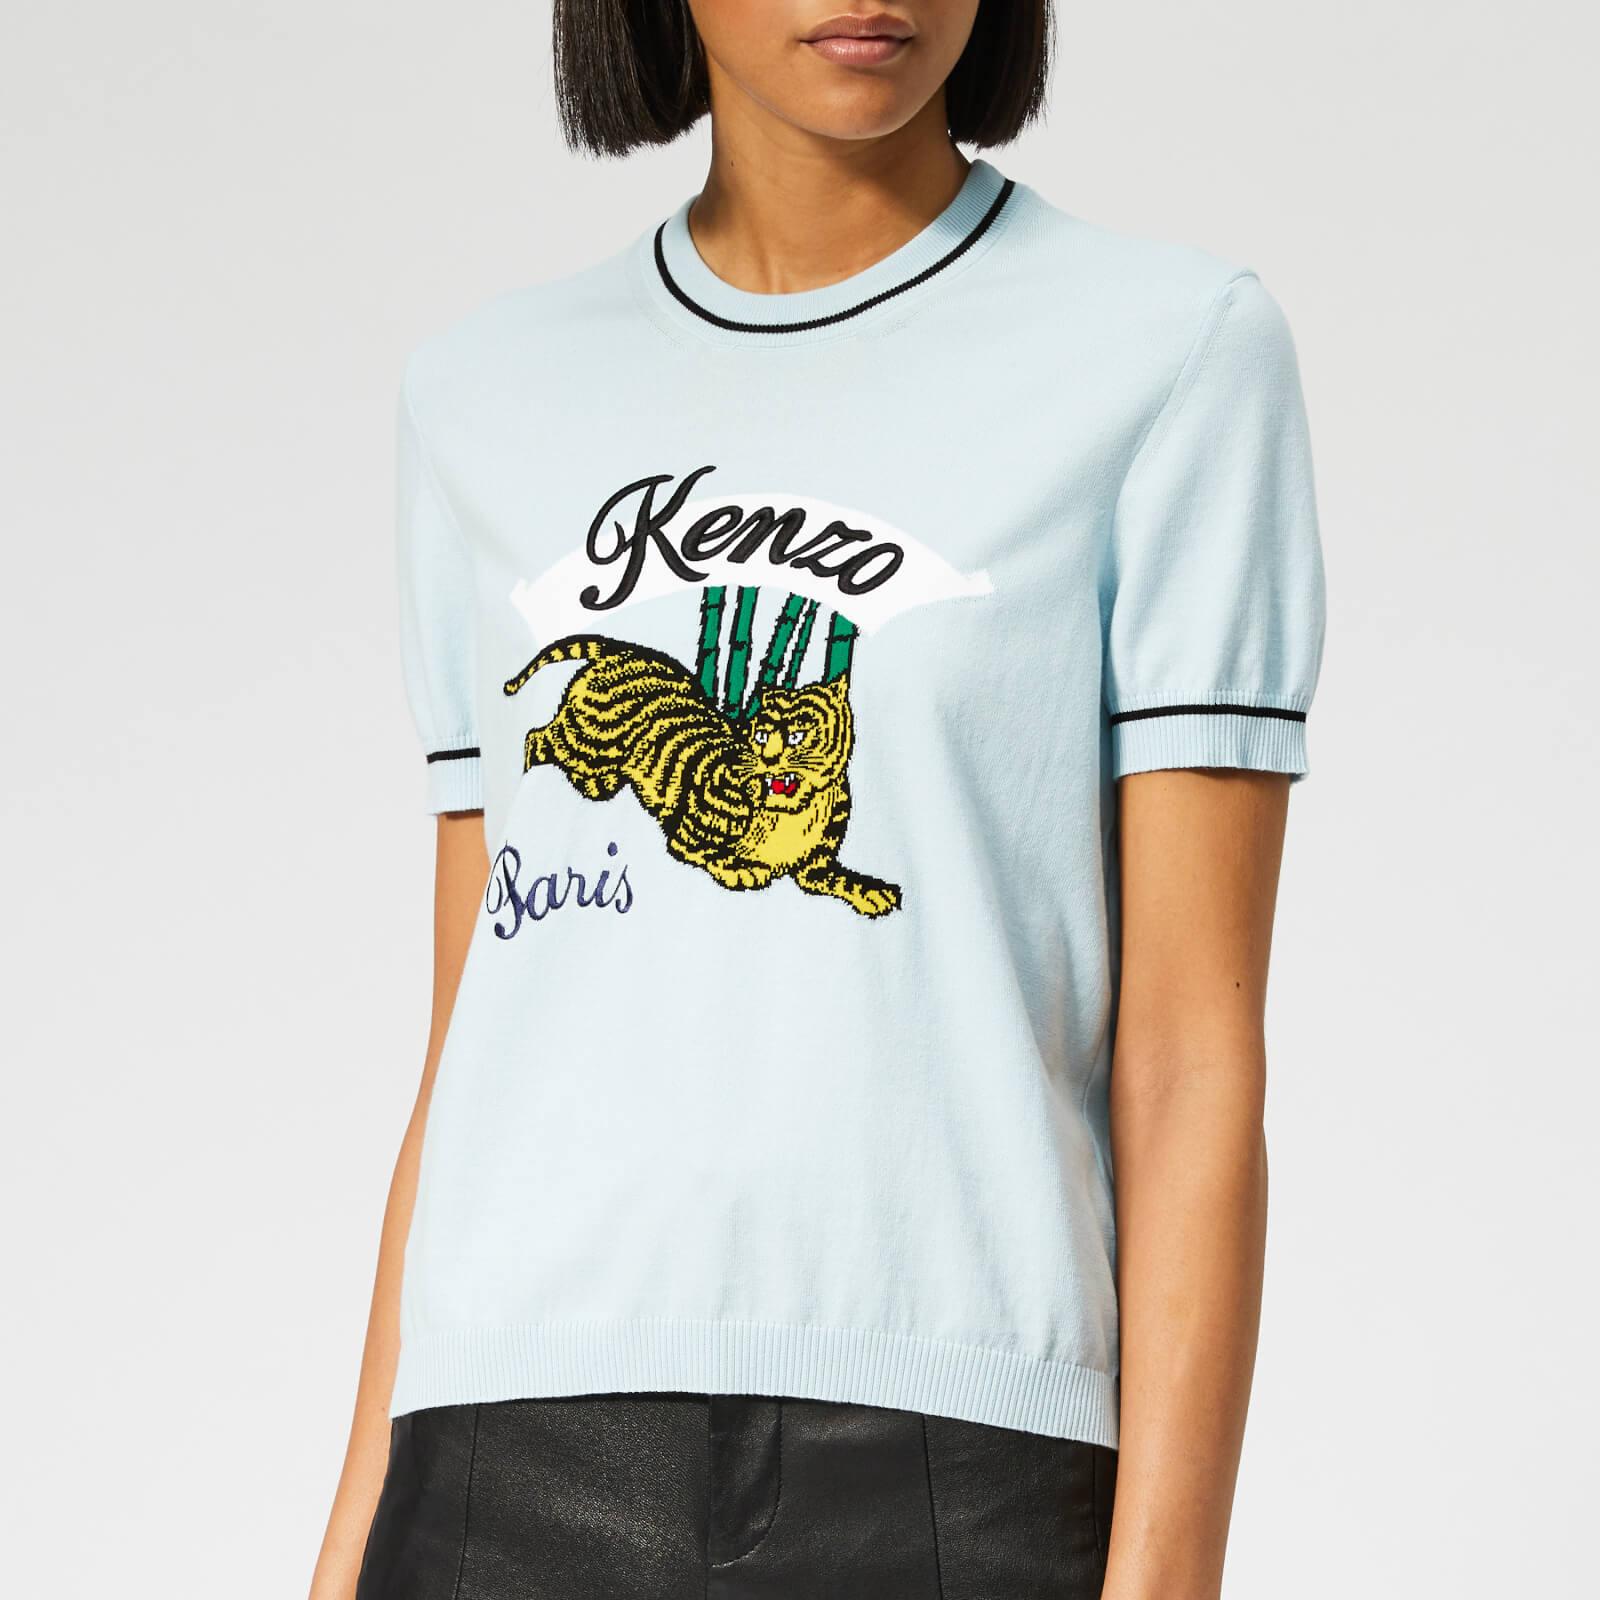 a41e9389b0 KENZO Women's Bamboo Tiger T-Shirt - Sky Blue